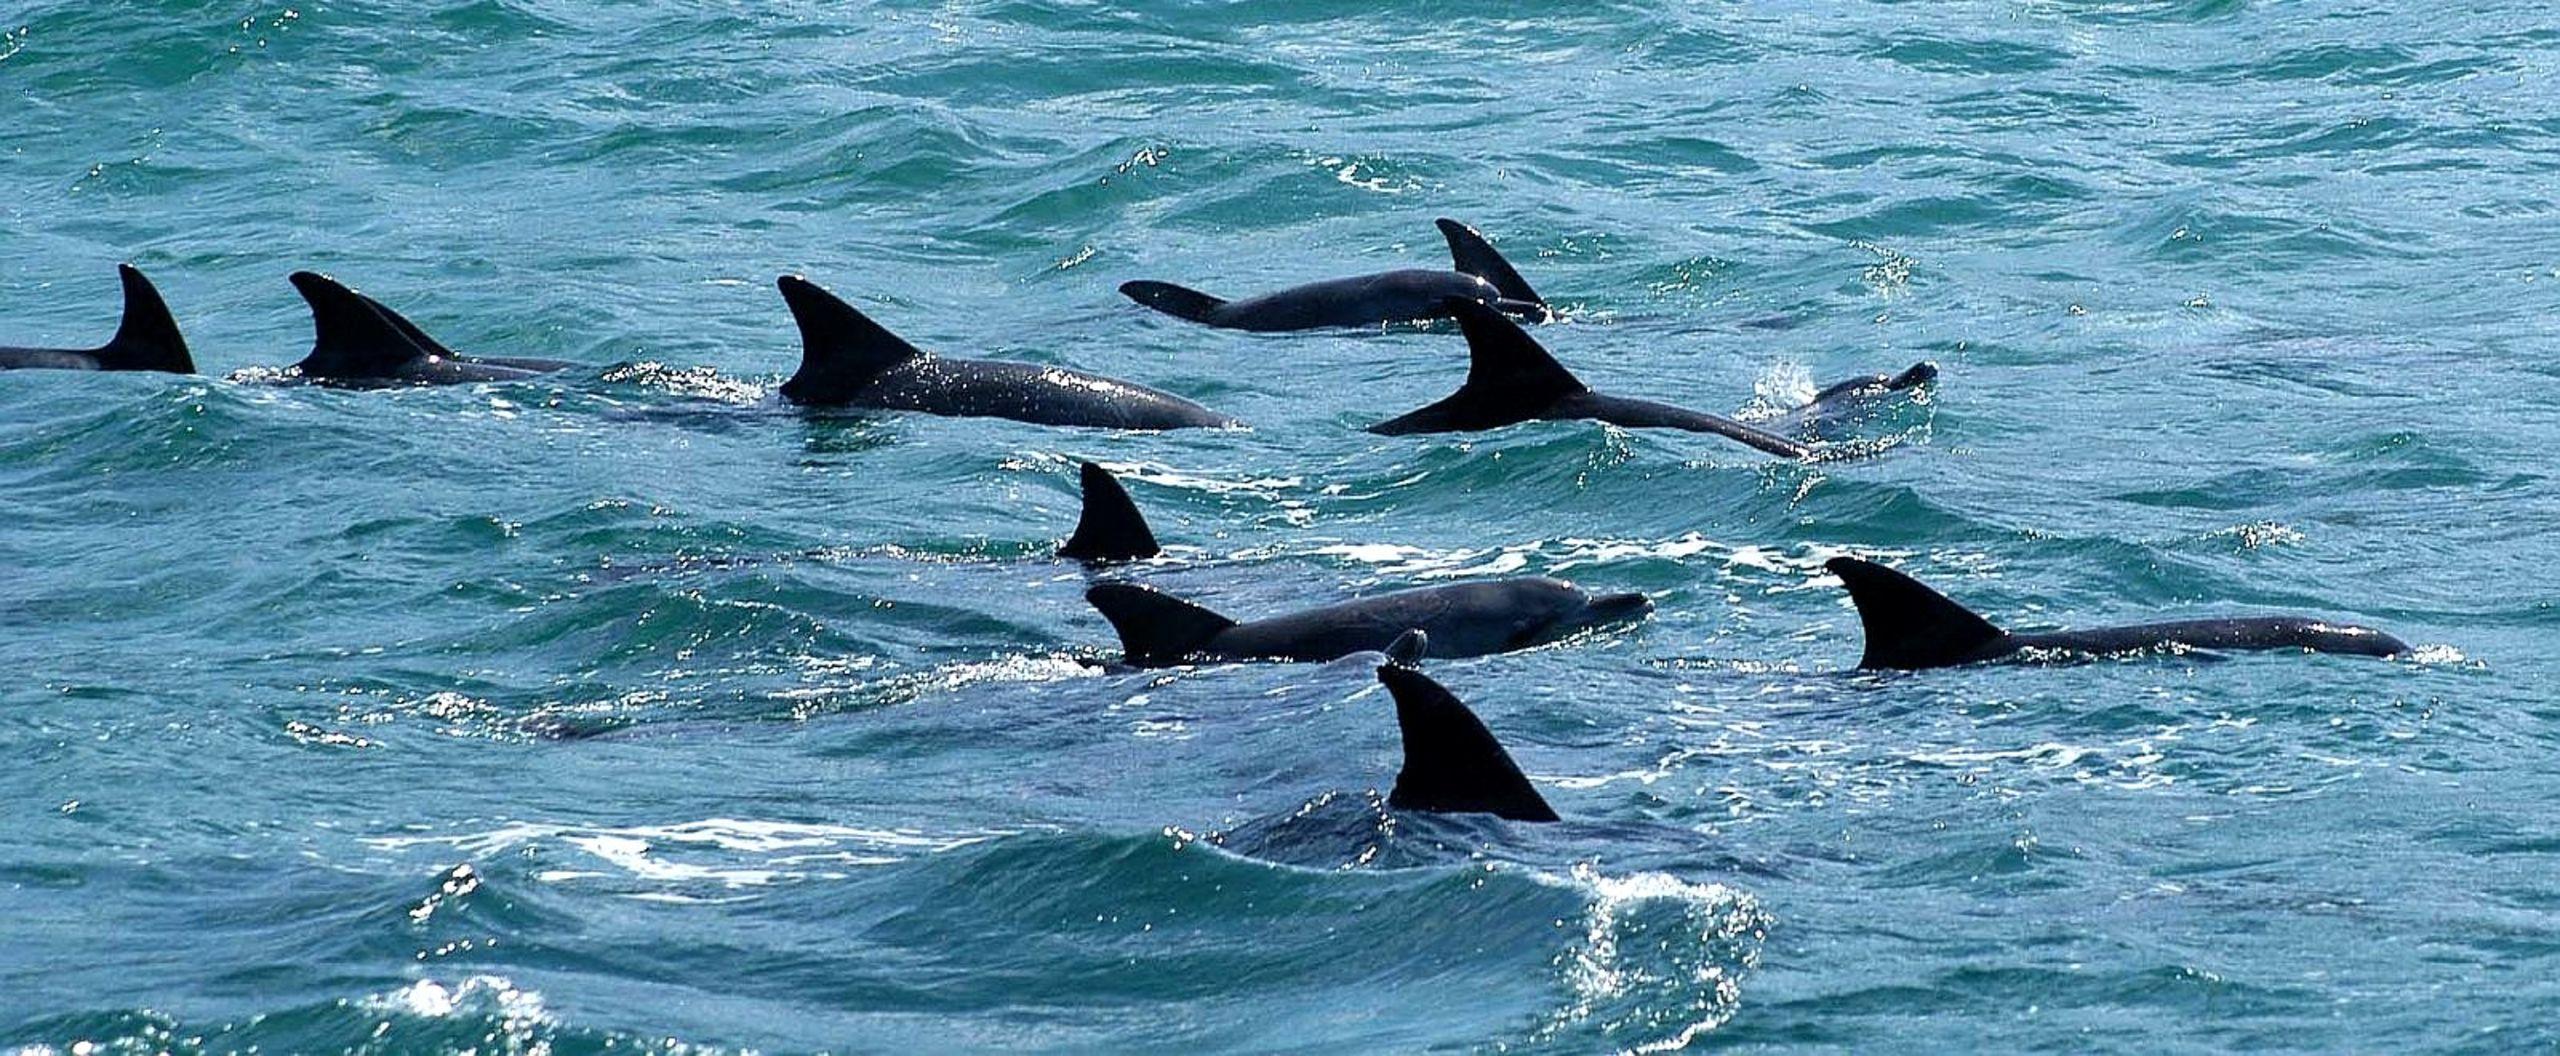 Bottlenose dolphins swimming off the brevard county shoreline